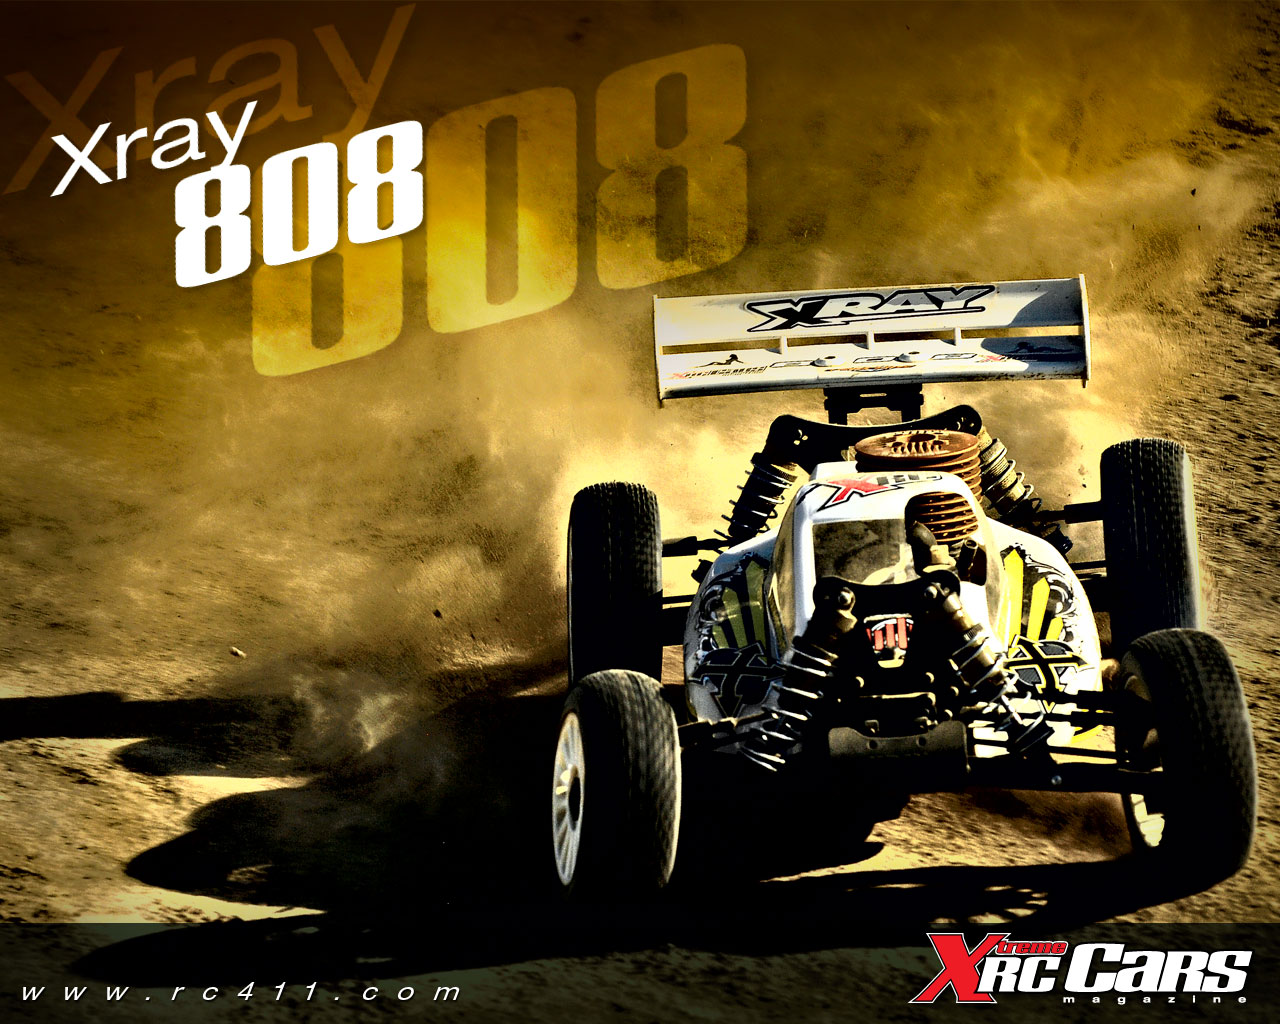 http://3.bp.blogspot.com/__ZTYagFP2f8/TR9bh7VvfjI/AAAAAAAAApA/b4cd-_3okTk/s1600/x+ray+808+rc+car.jpg